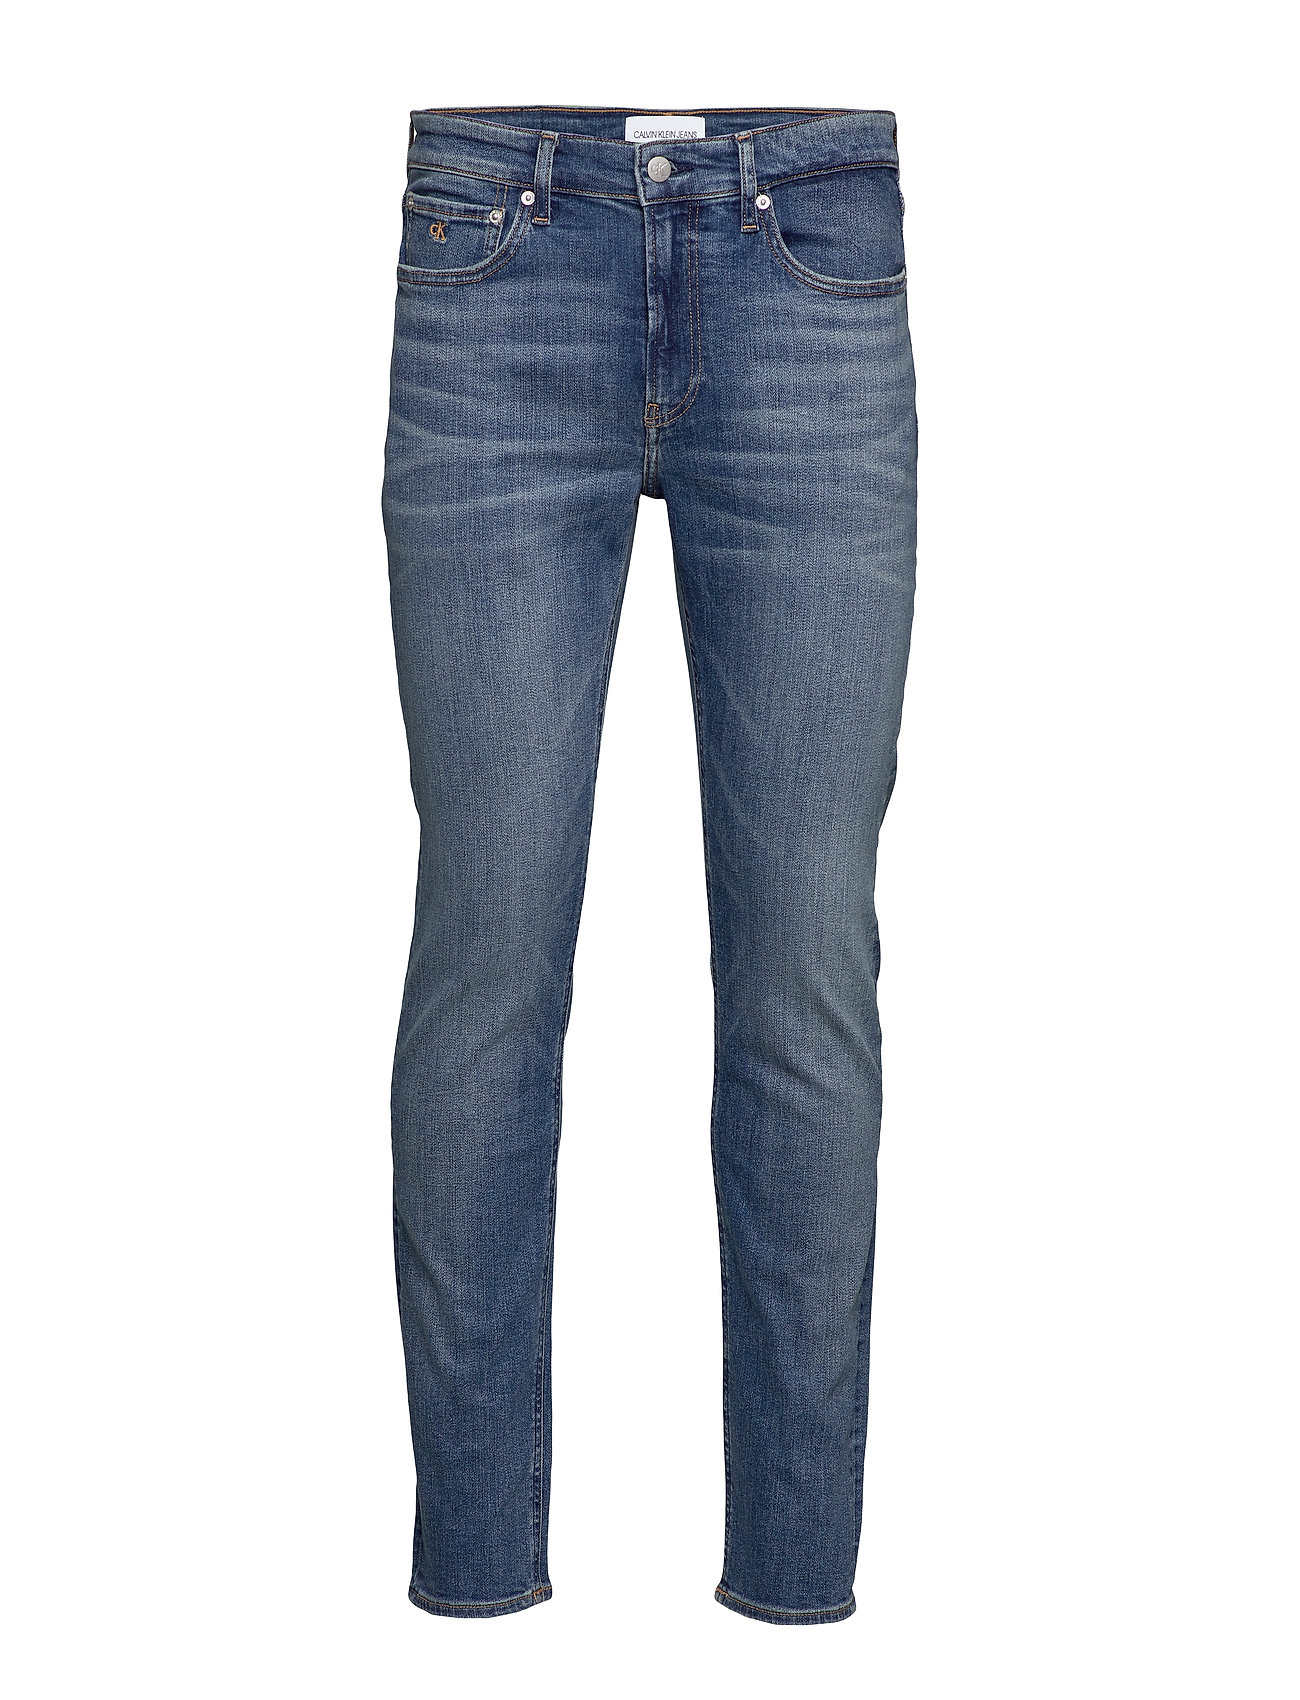 Calvin Klein Jeans CKJ 058 SLIM TAPER - CA109 DARK BLUE